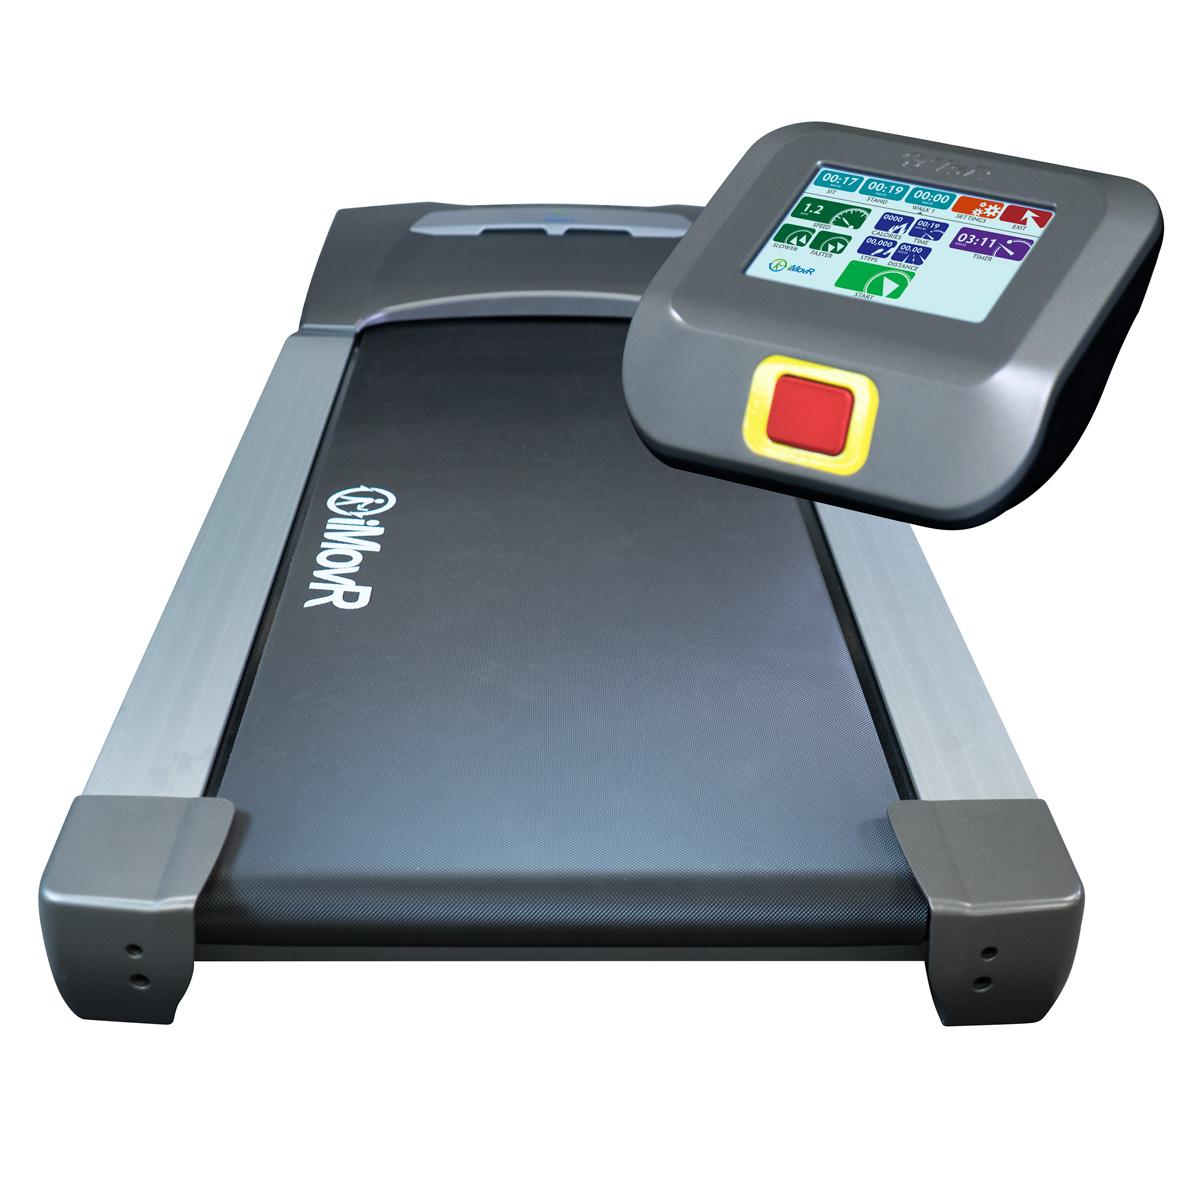 steelcase cheap desk reviews s thinkspace diy treadmill super it walkstation